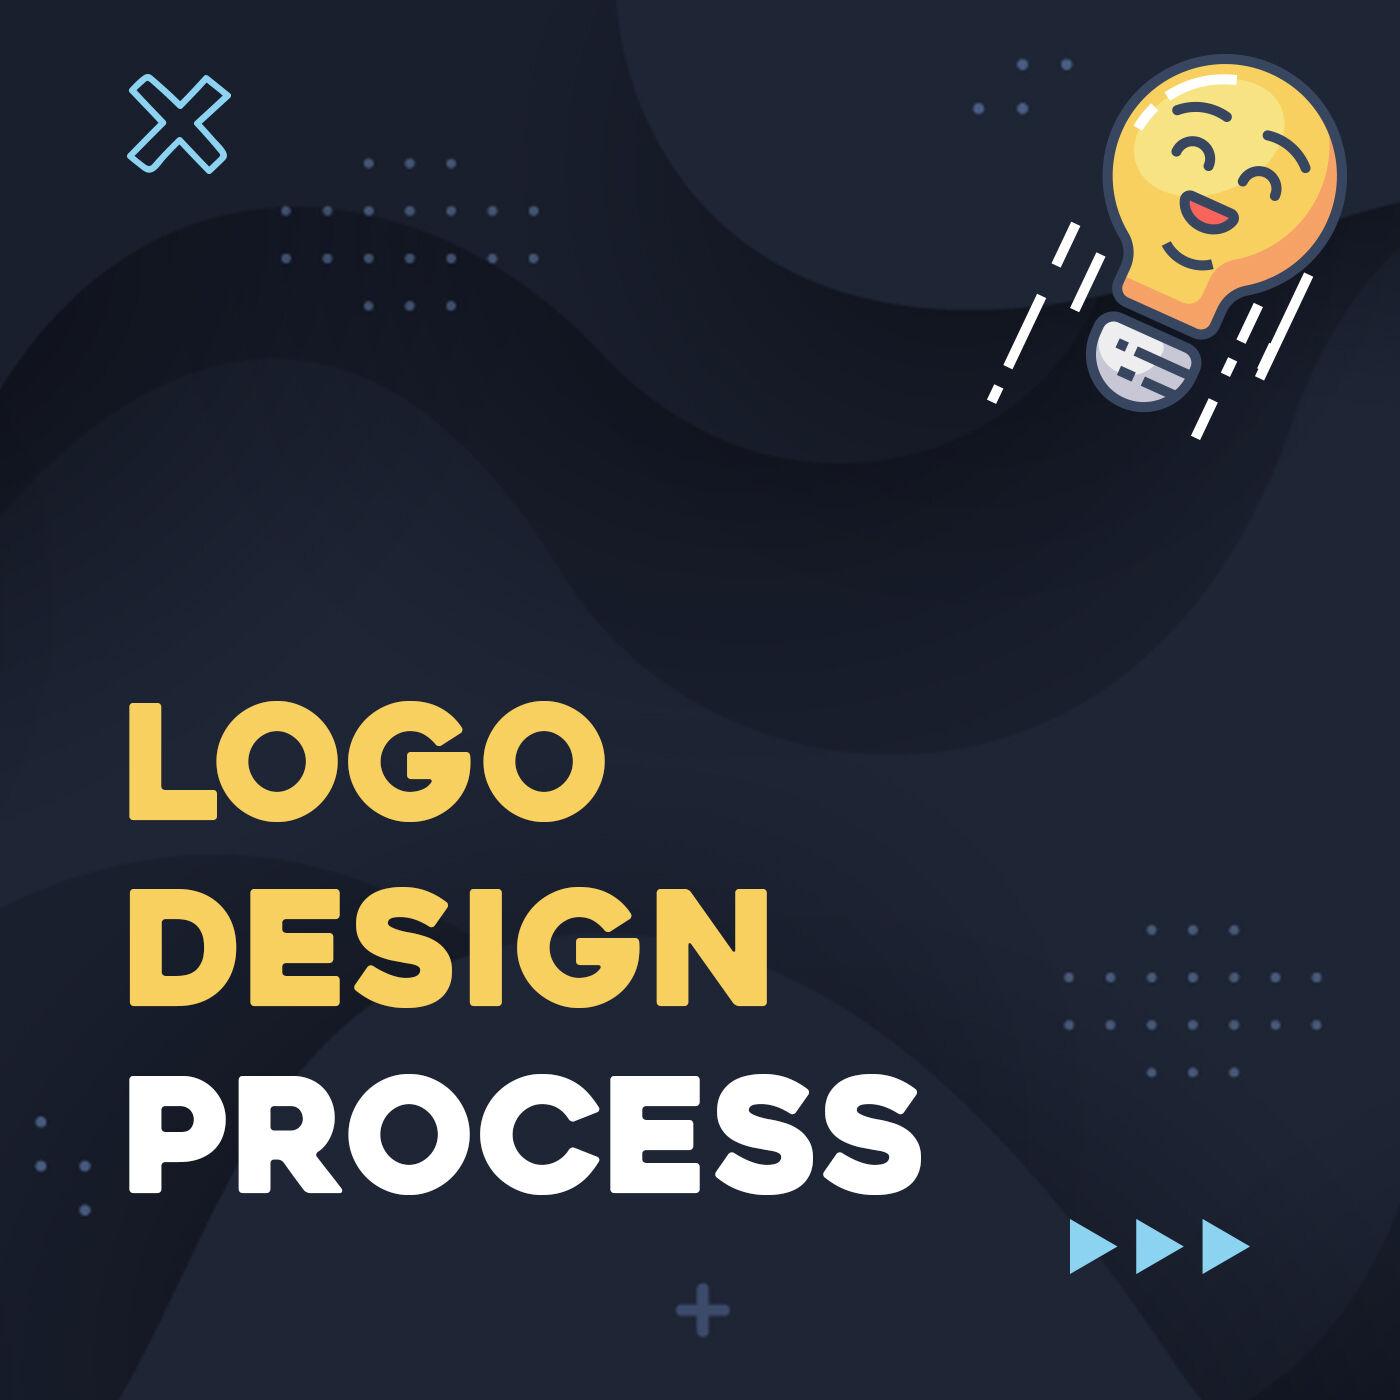 #11 Logo Design Process